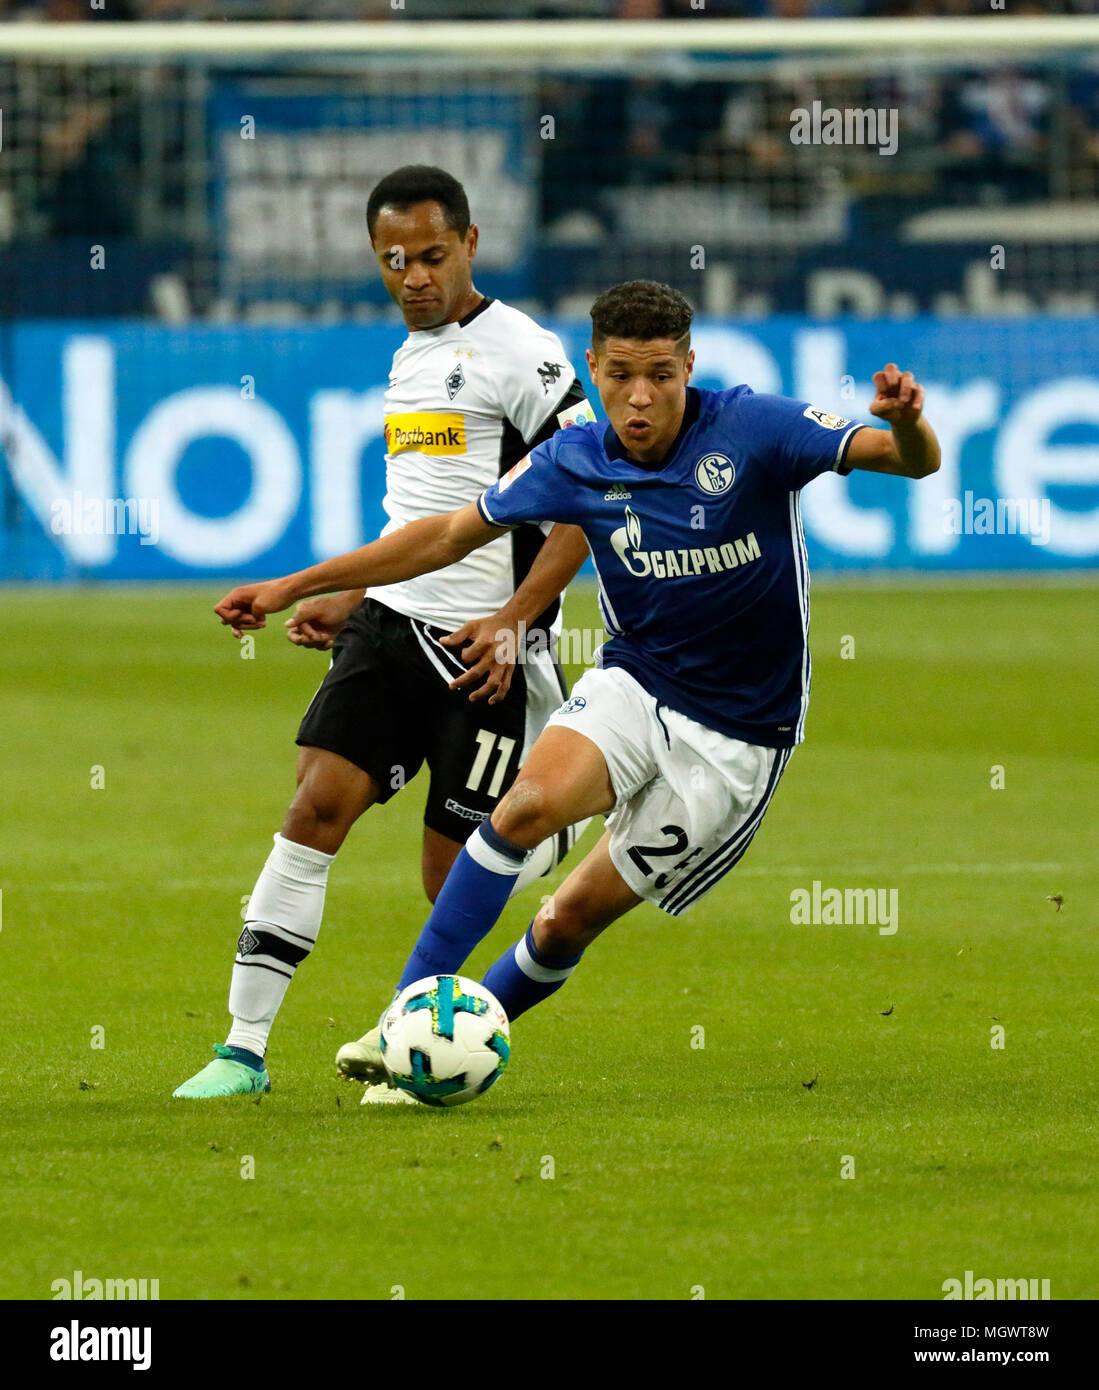 sports, football, Bundesliga, 2017/2018, FC Schalke 04 vs Borussia Moenchengladbach 1:1, Veltins Arena Gelsenkirchen, scene of the match, Amine Harit (S04) in ball possession, left Raffael (MG) - Stock Image